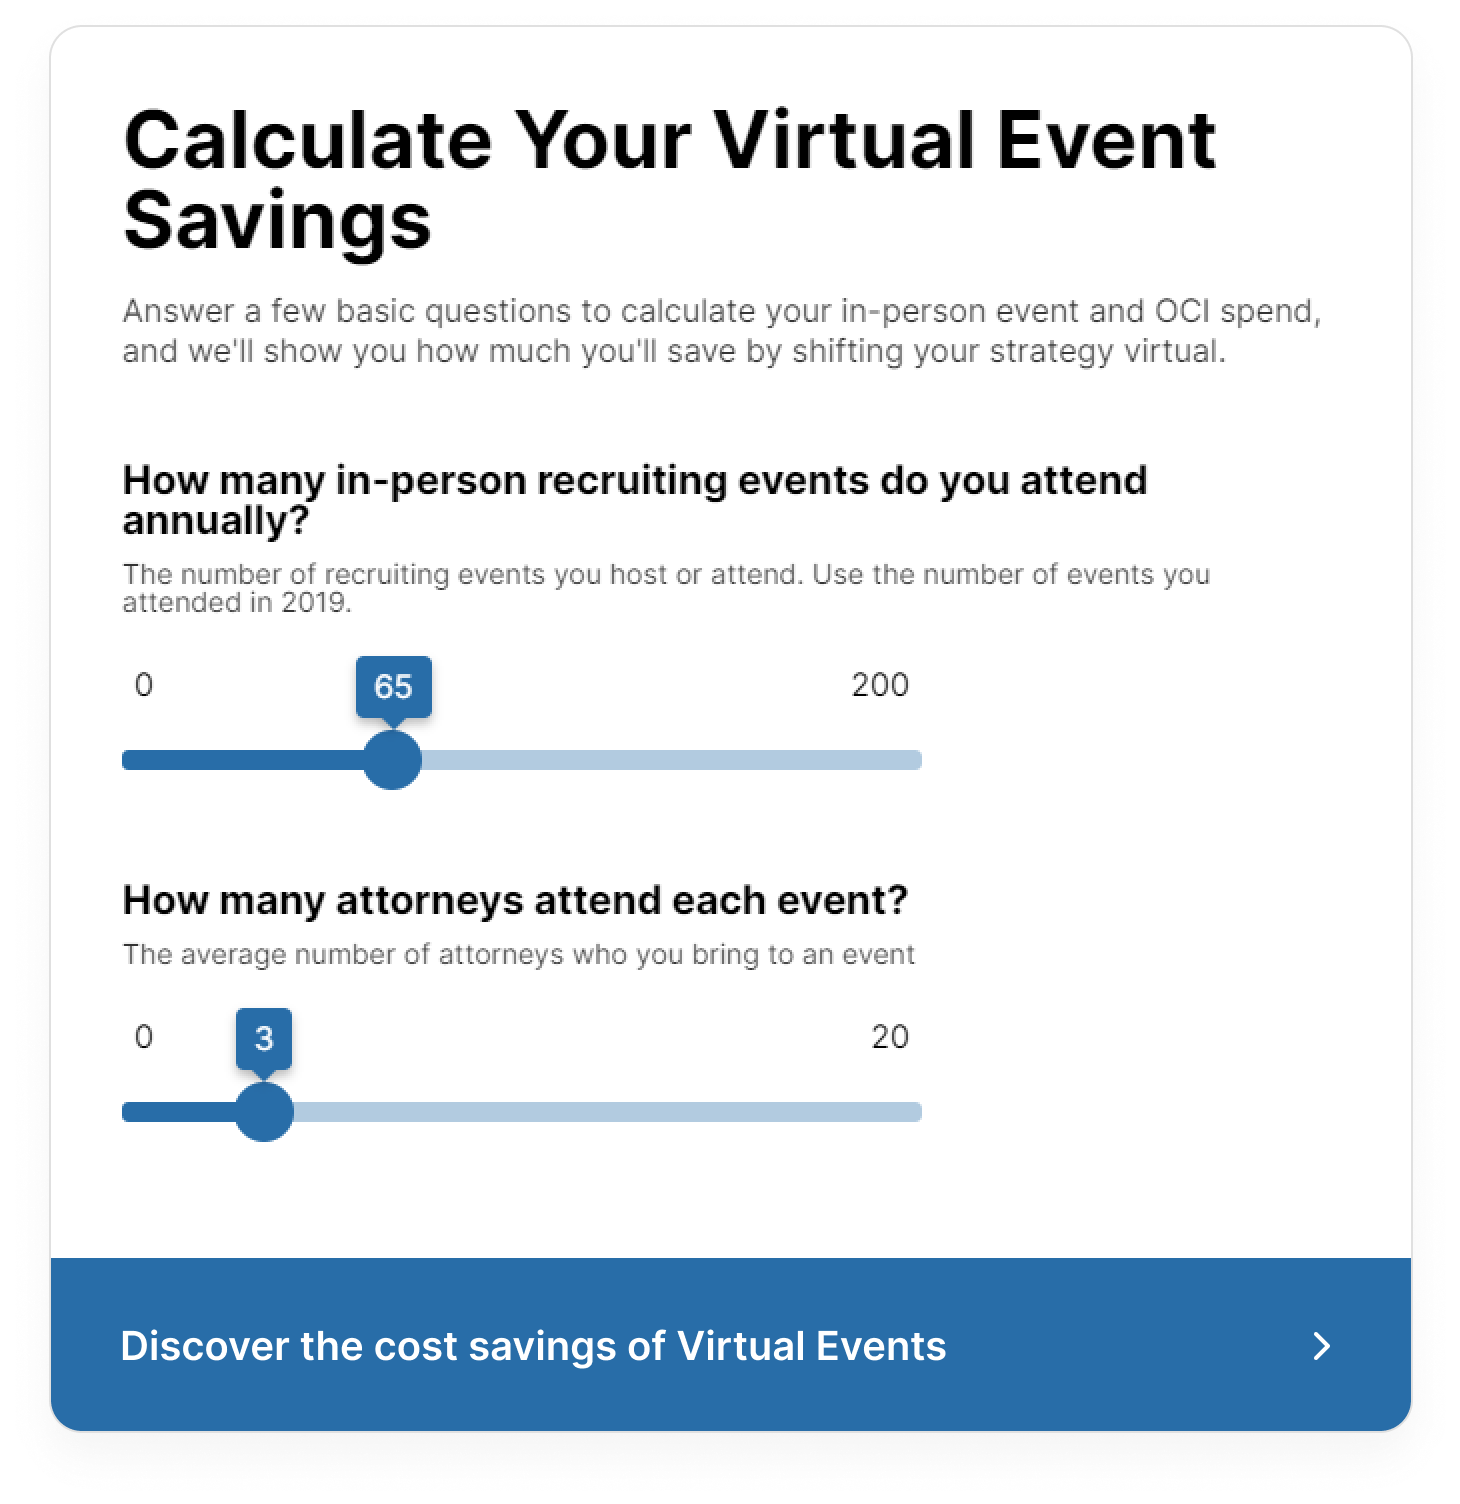 Flo Recruit Virtual Event savings calculator